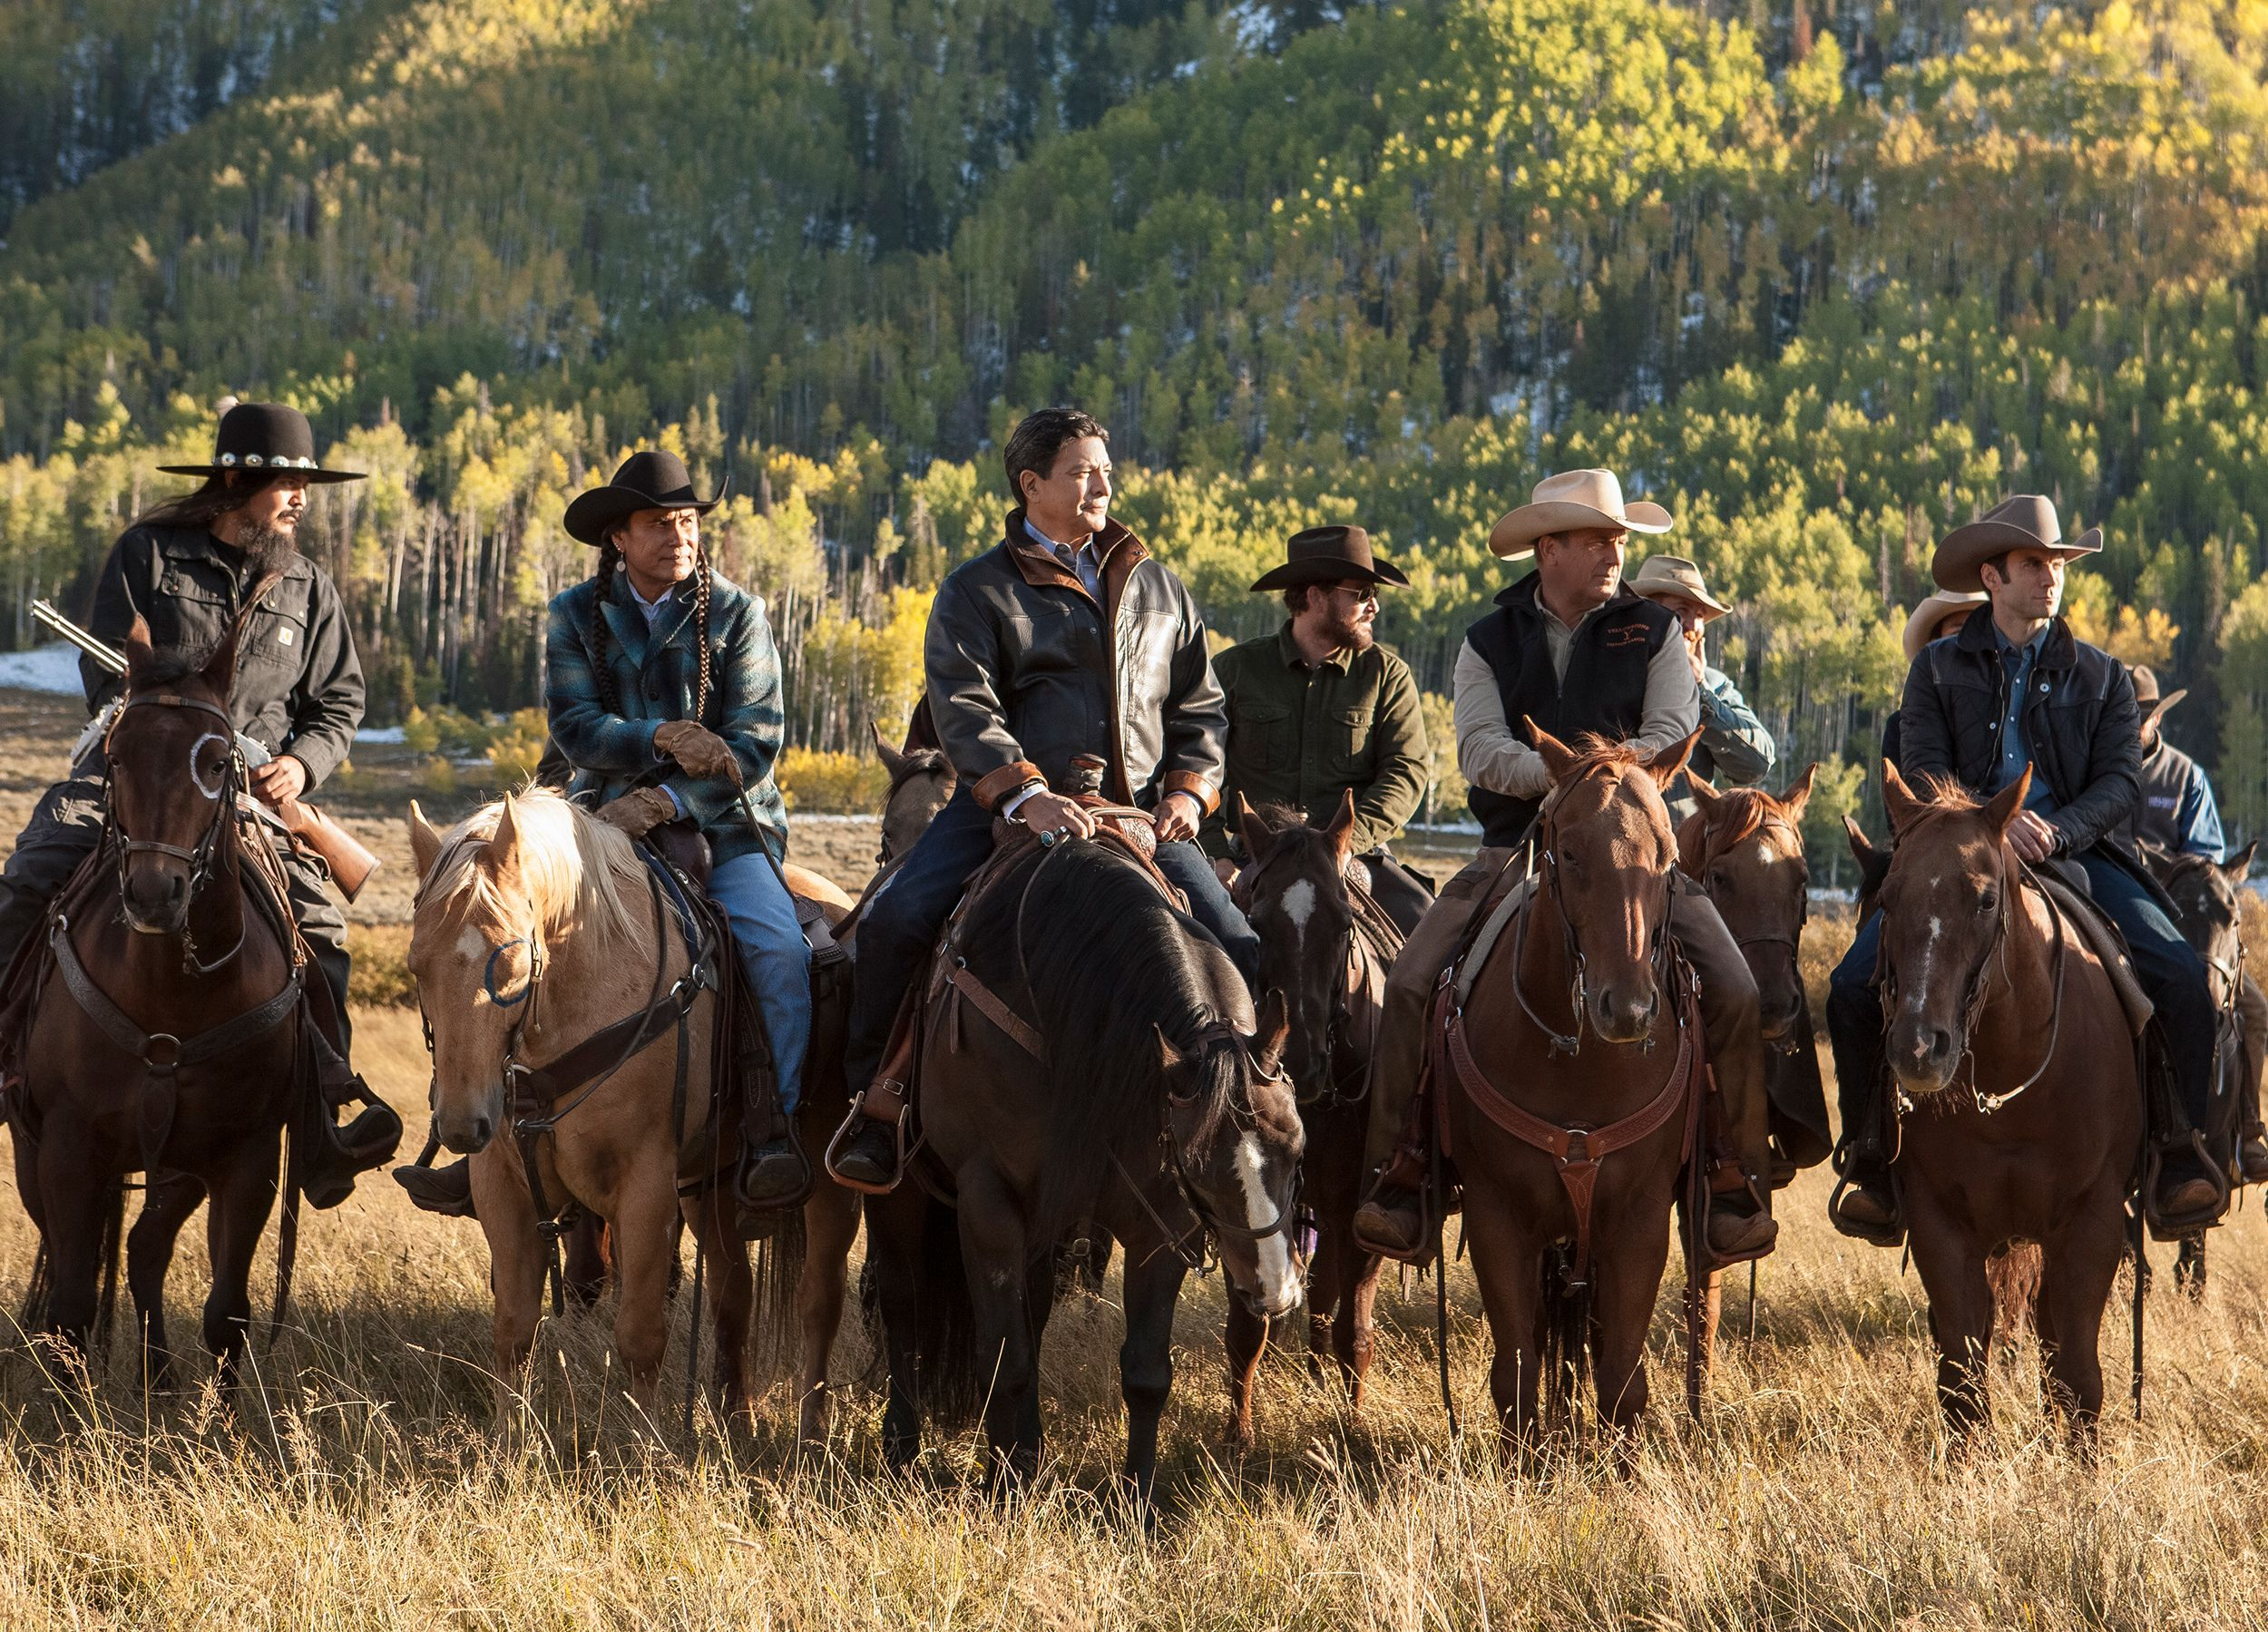 'Yellowstone' Renewed for Season 2 at Paramount Network